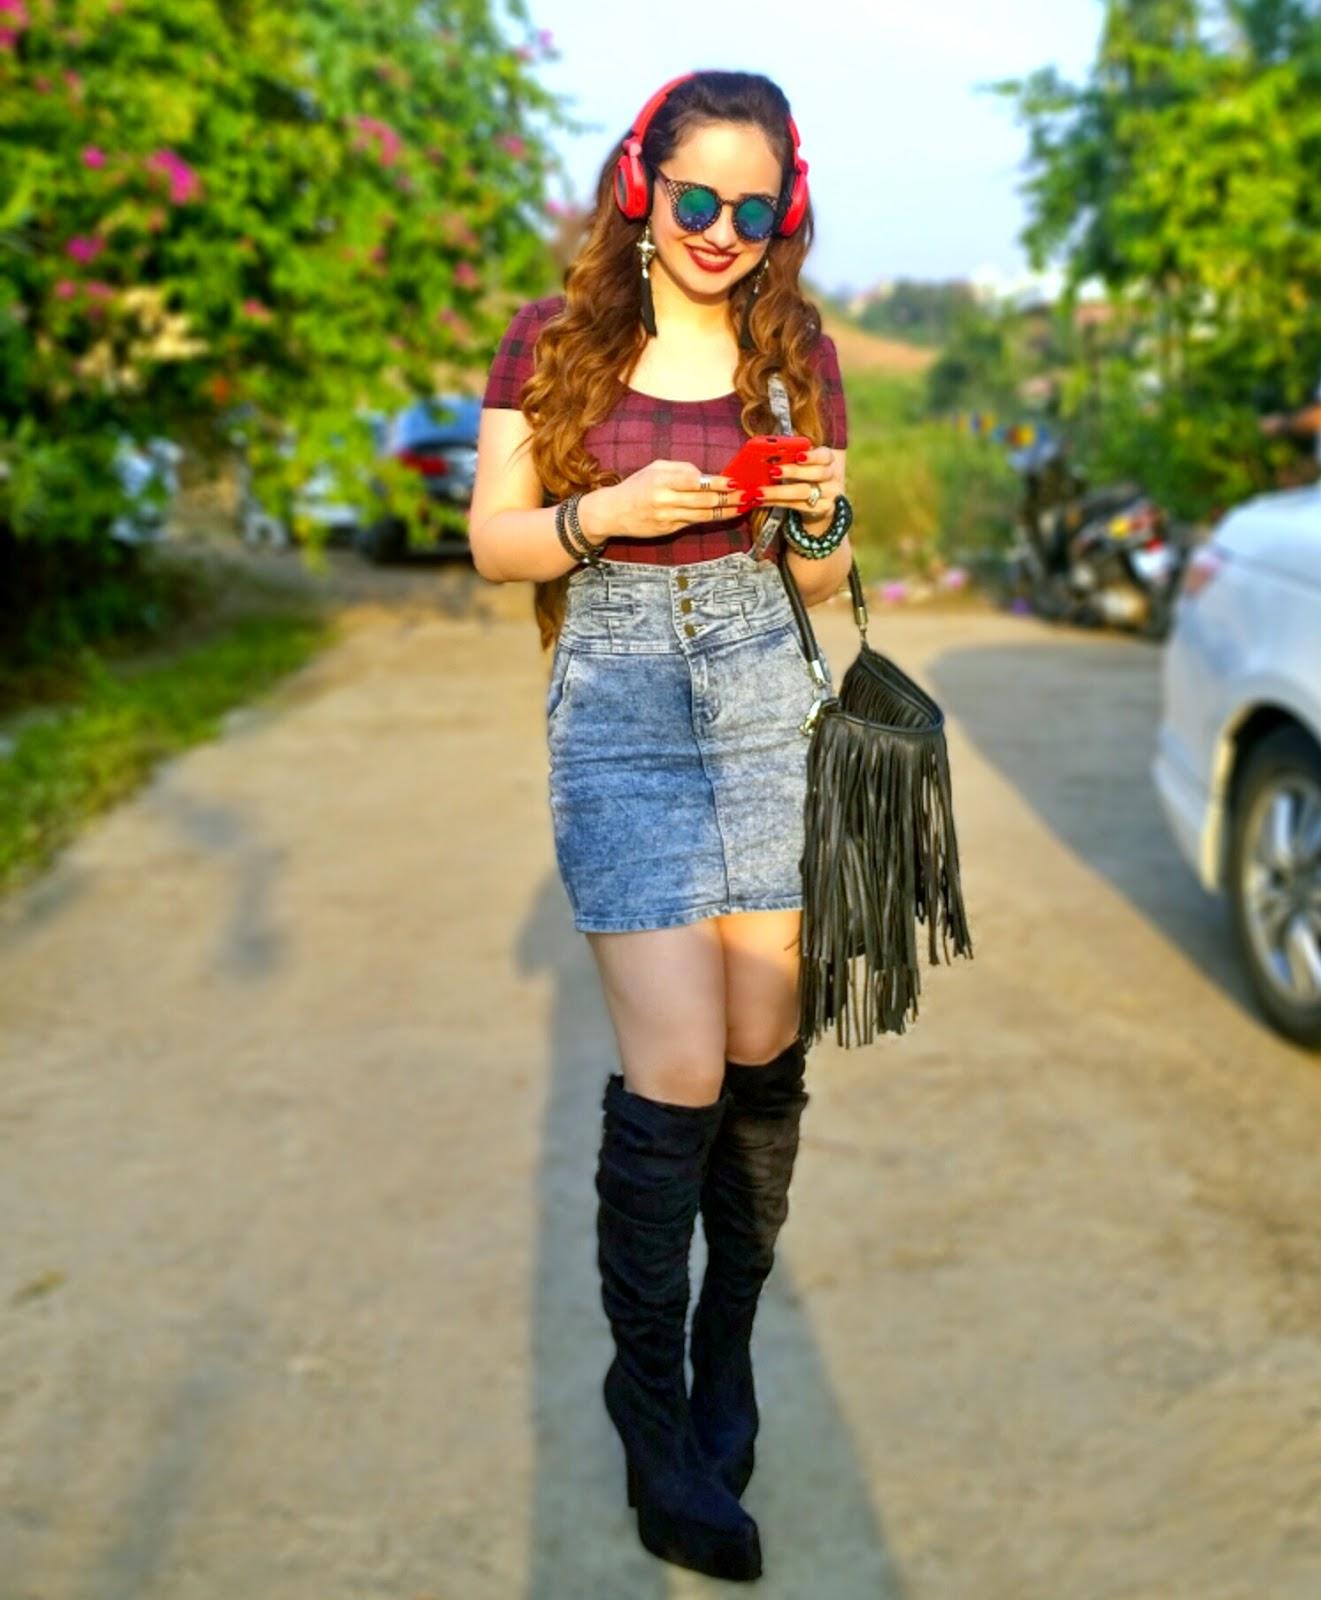 Tartan Plaid Crop Top,Denim Suspender Skirt,Over the knee boots,JBL Wireless Headphones